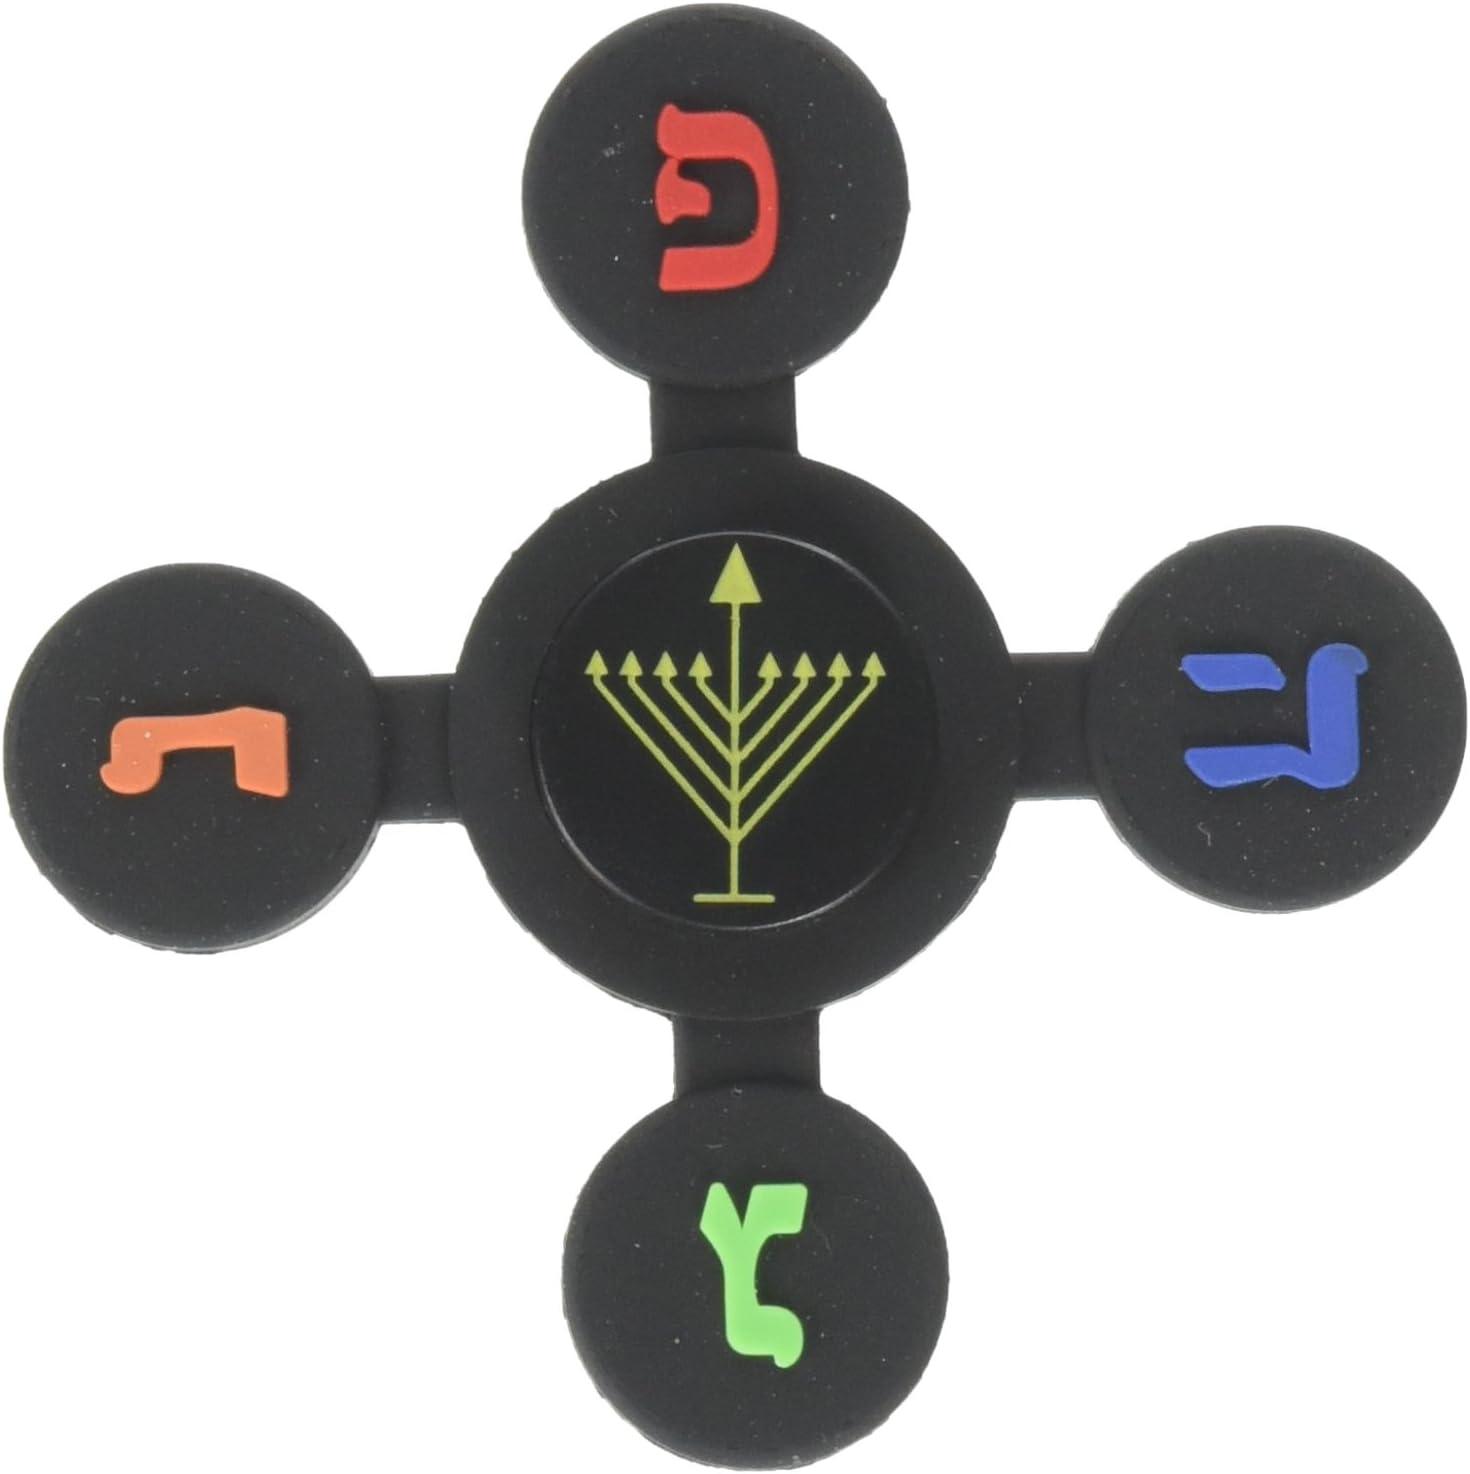 Judaica Mega Mall Chanukkah Dreidel Toy Dreidel Spinner Game Black